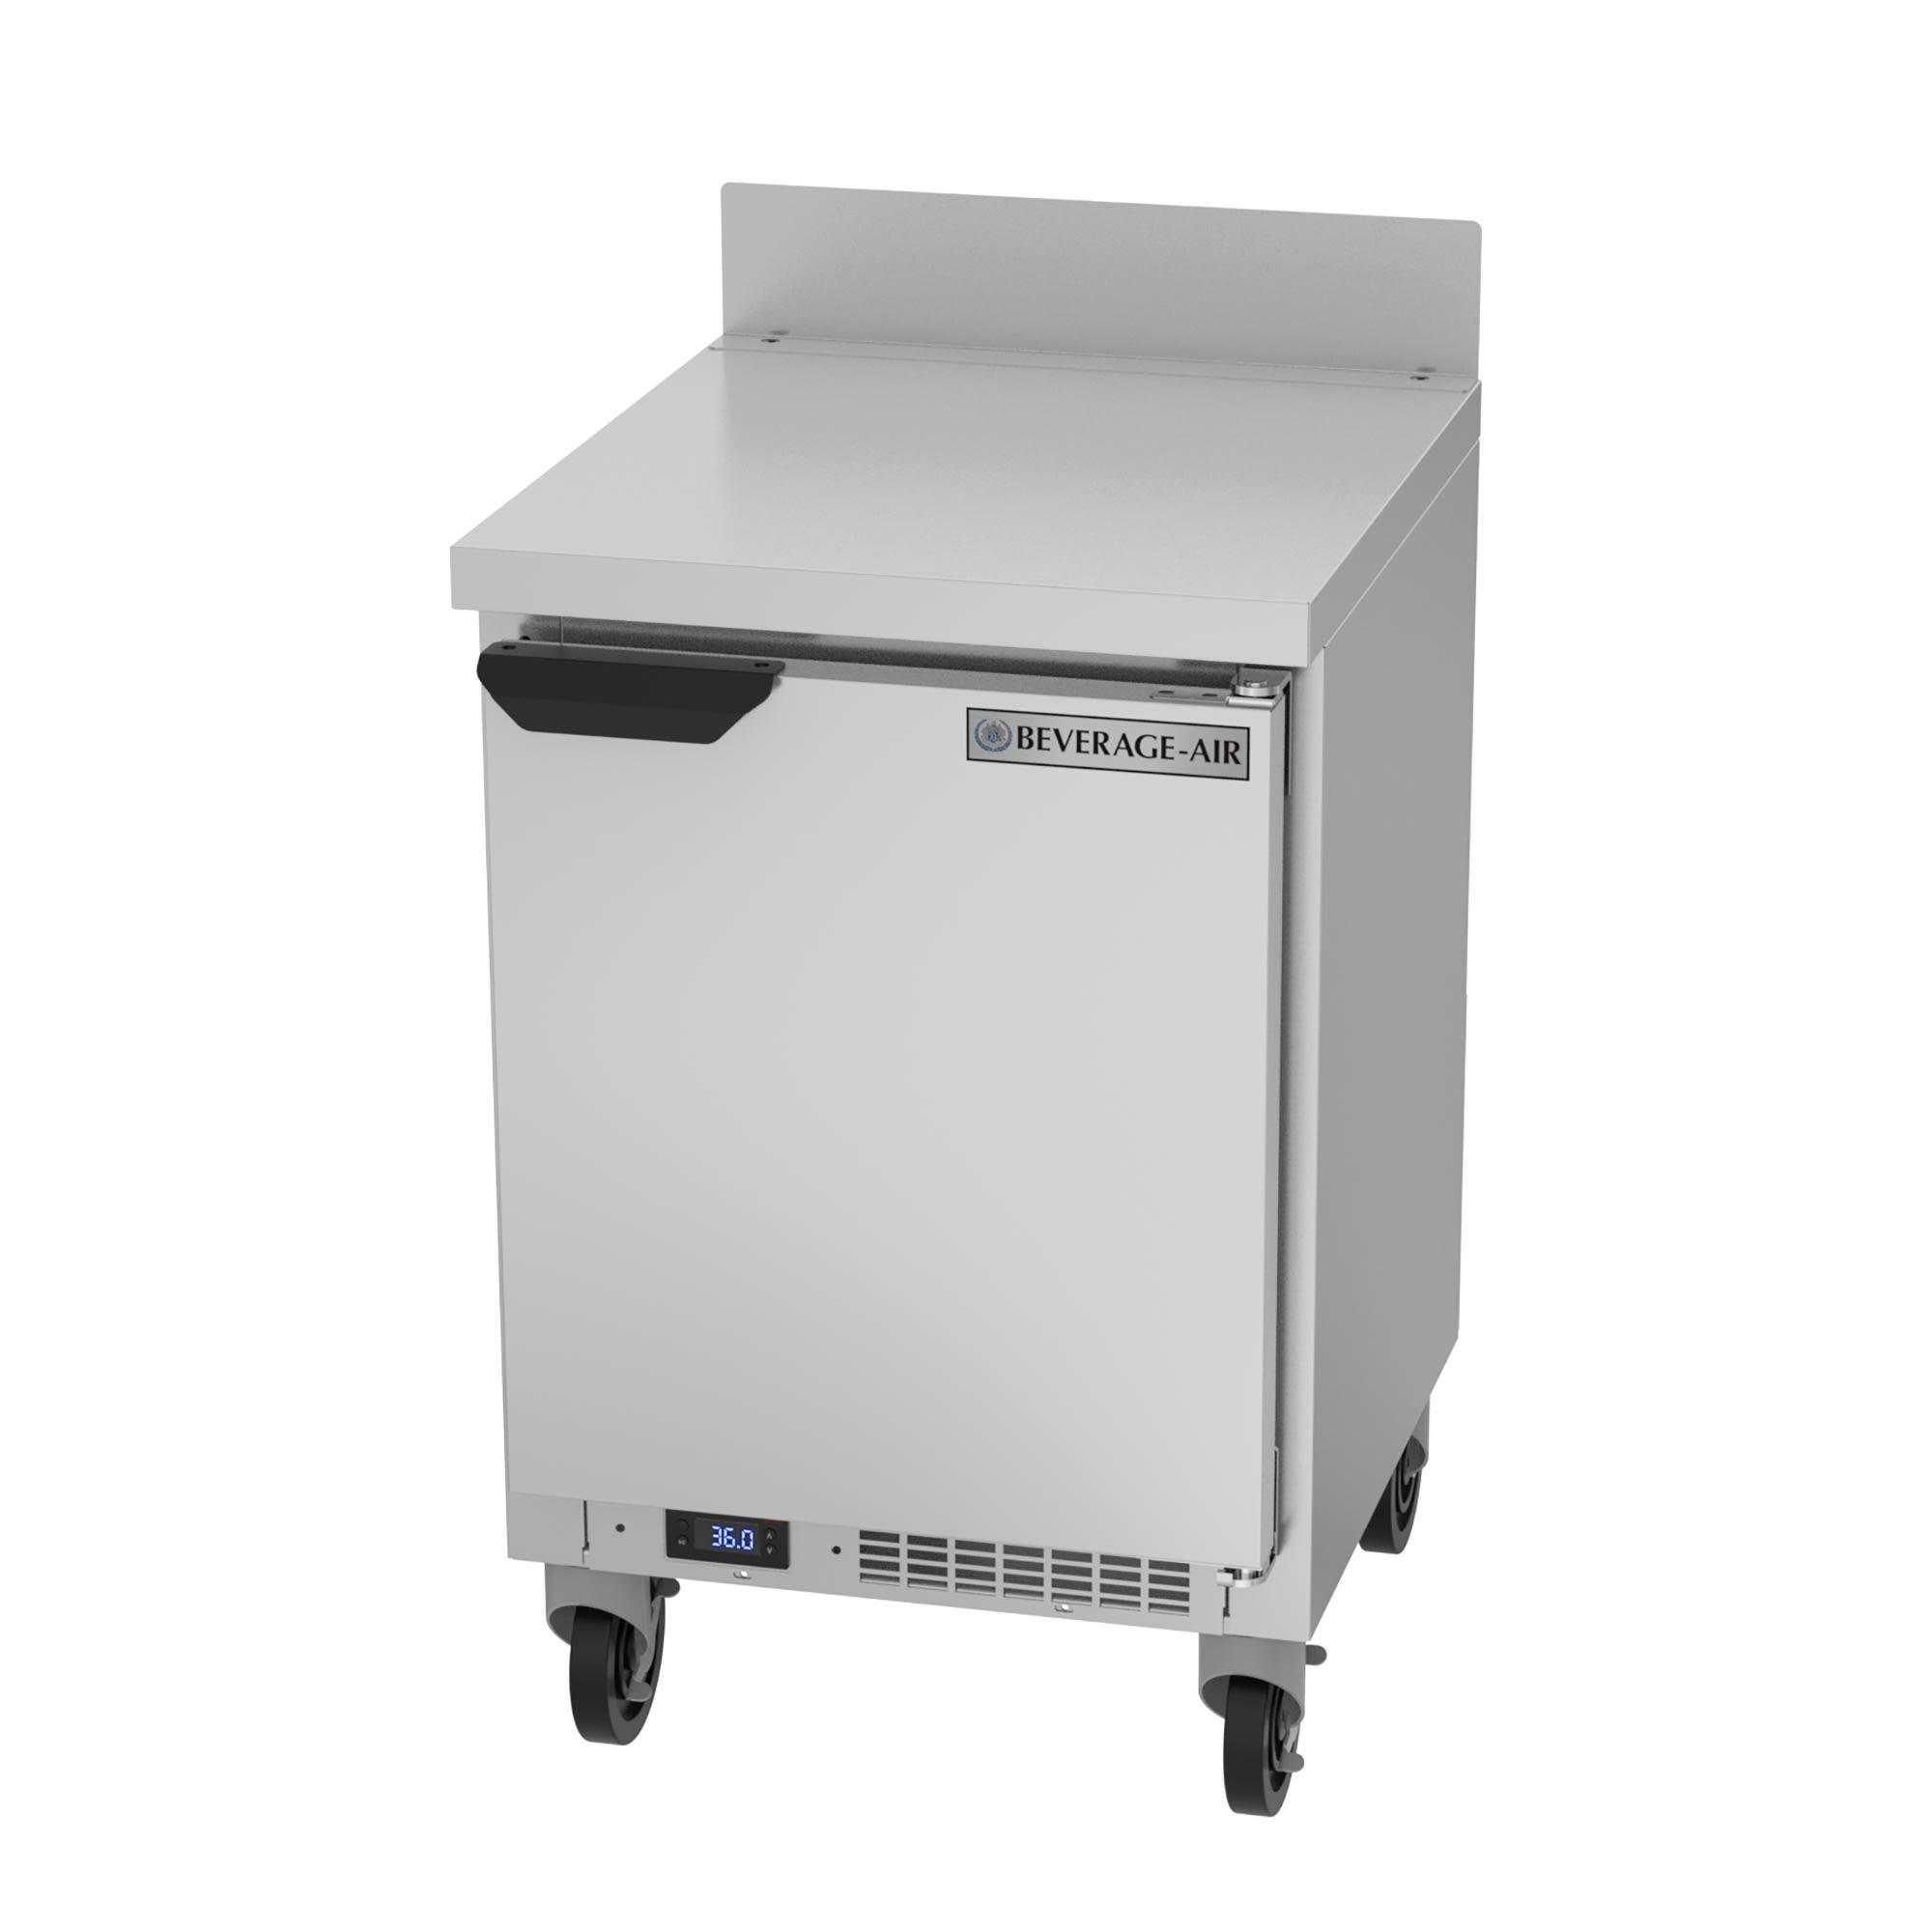 "Beverage Air WTR20HC 20"" Worktop Refrigerator w/ (1) Section, 115v"